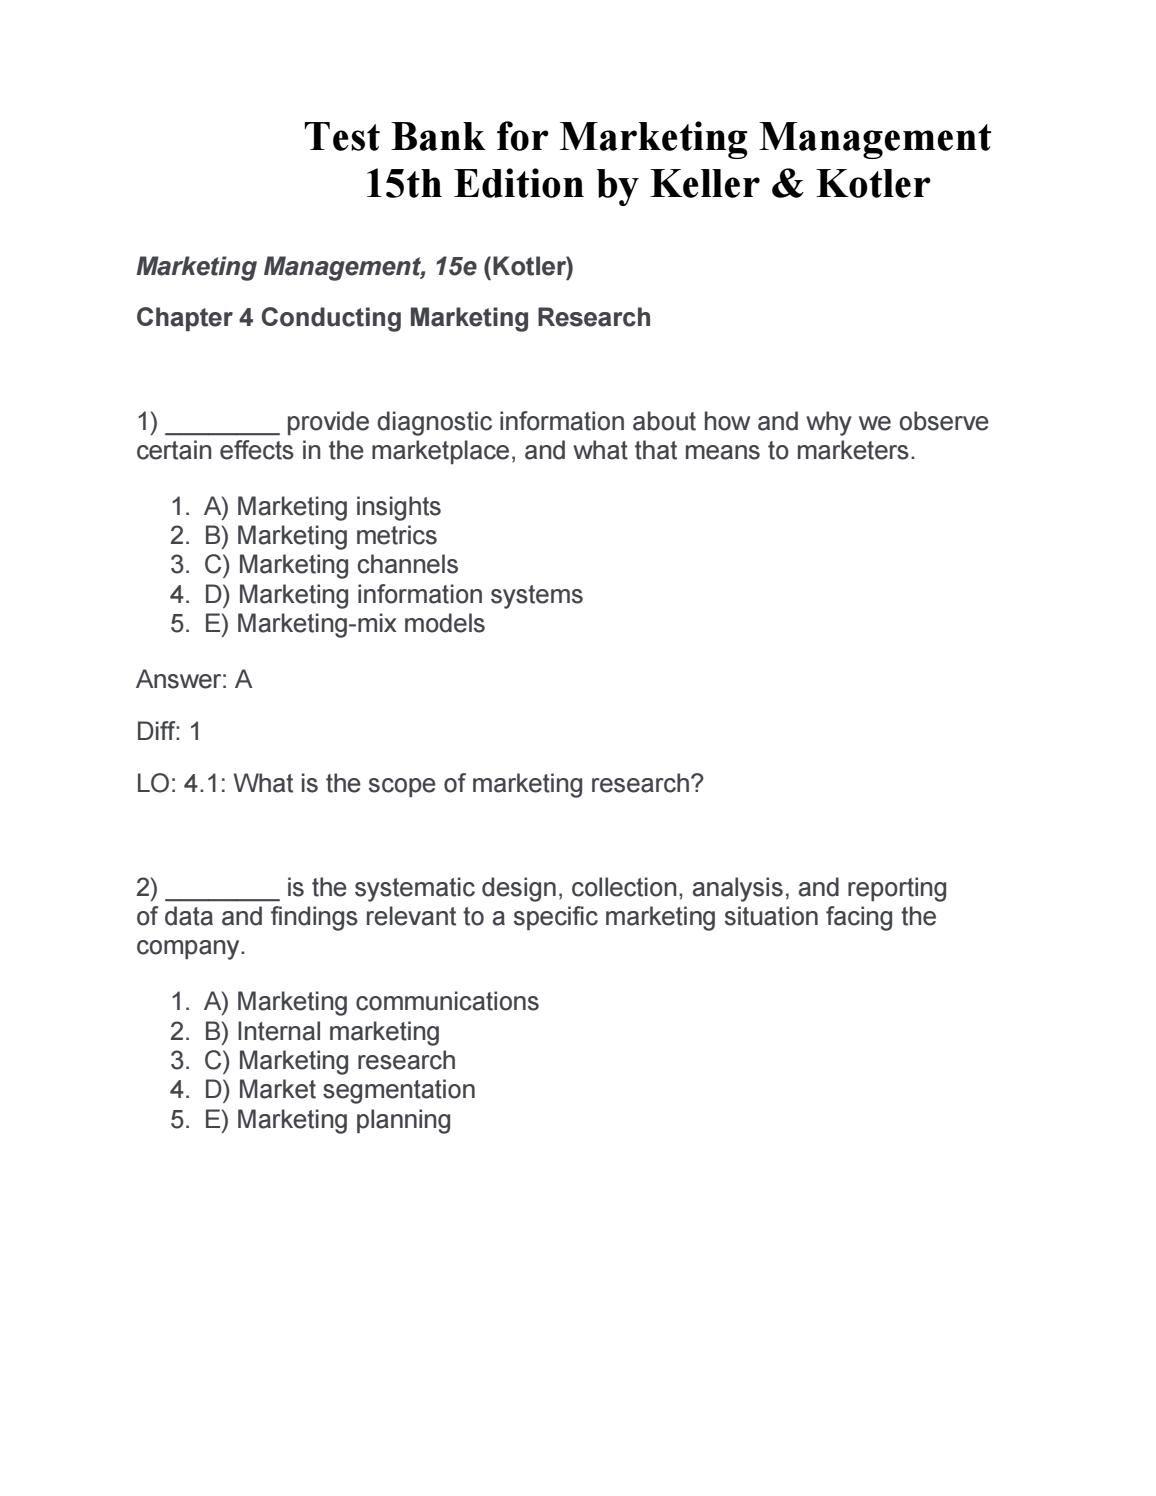 Kotler and keller market management 14e quiz answers